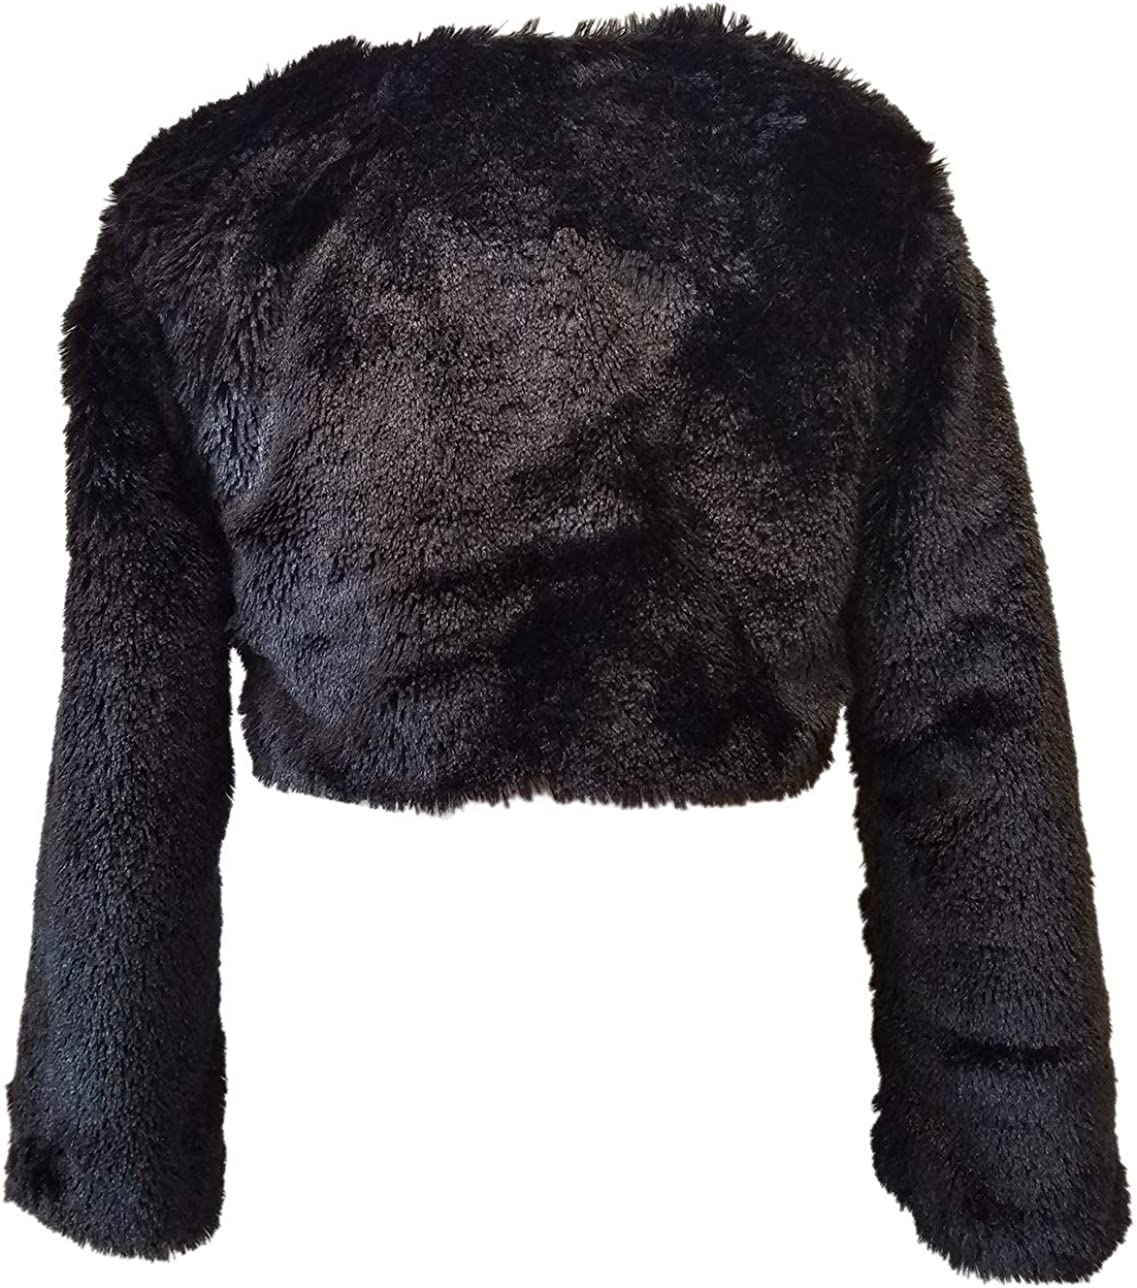 BNY Corner Little Girl Faux Fur Dress Coat Flower Girl Bolero Jacket Winter 6-16